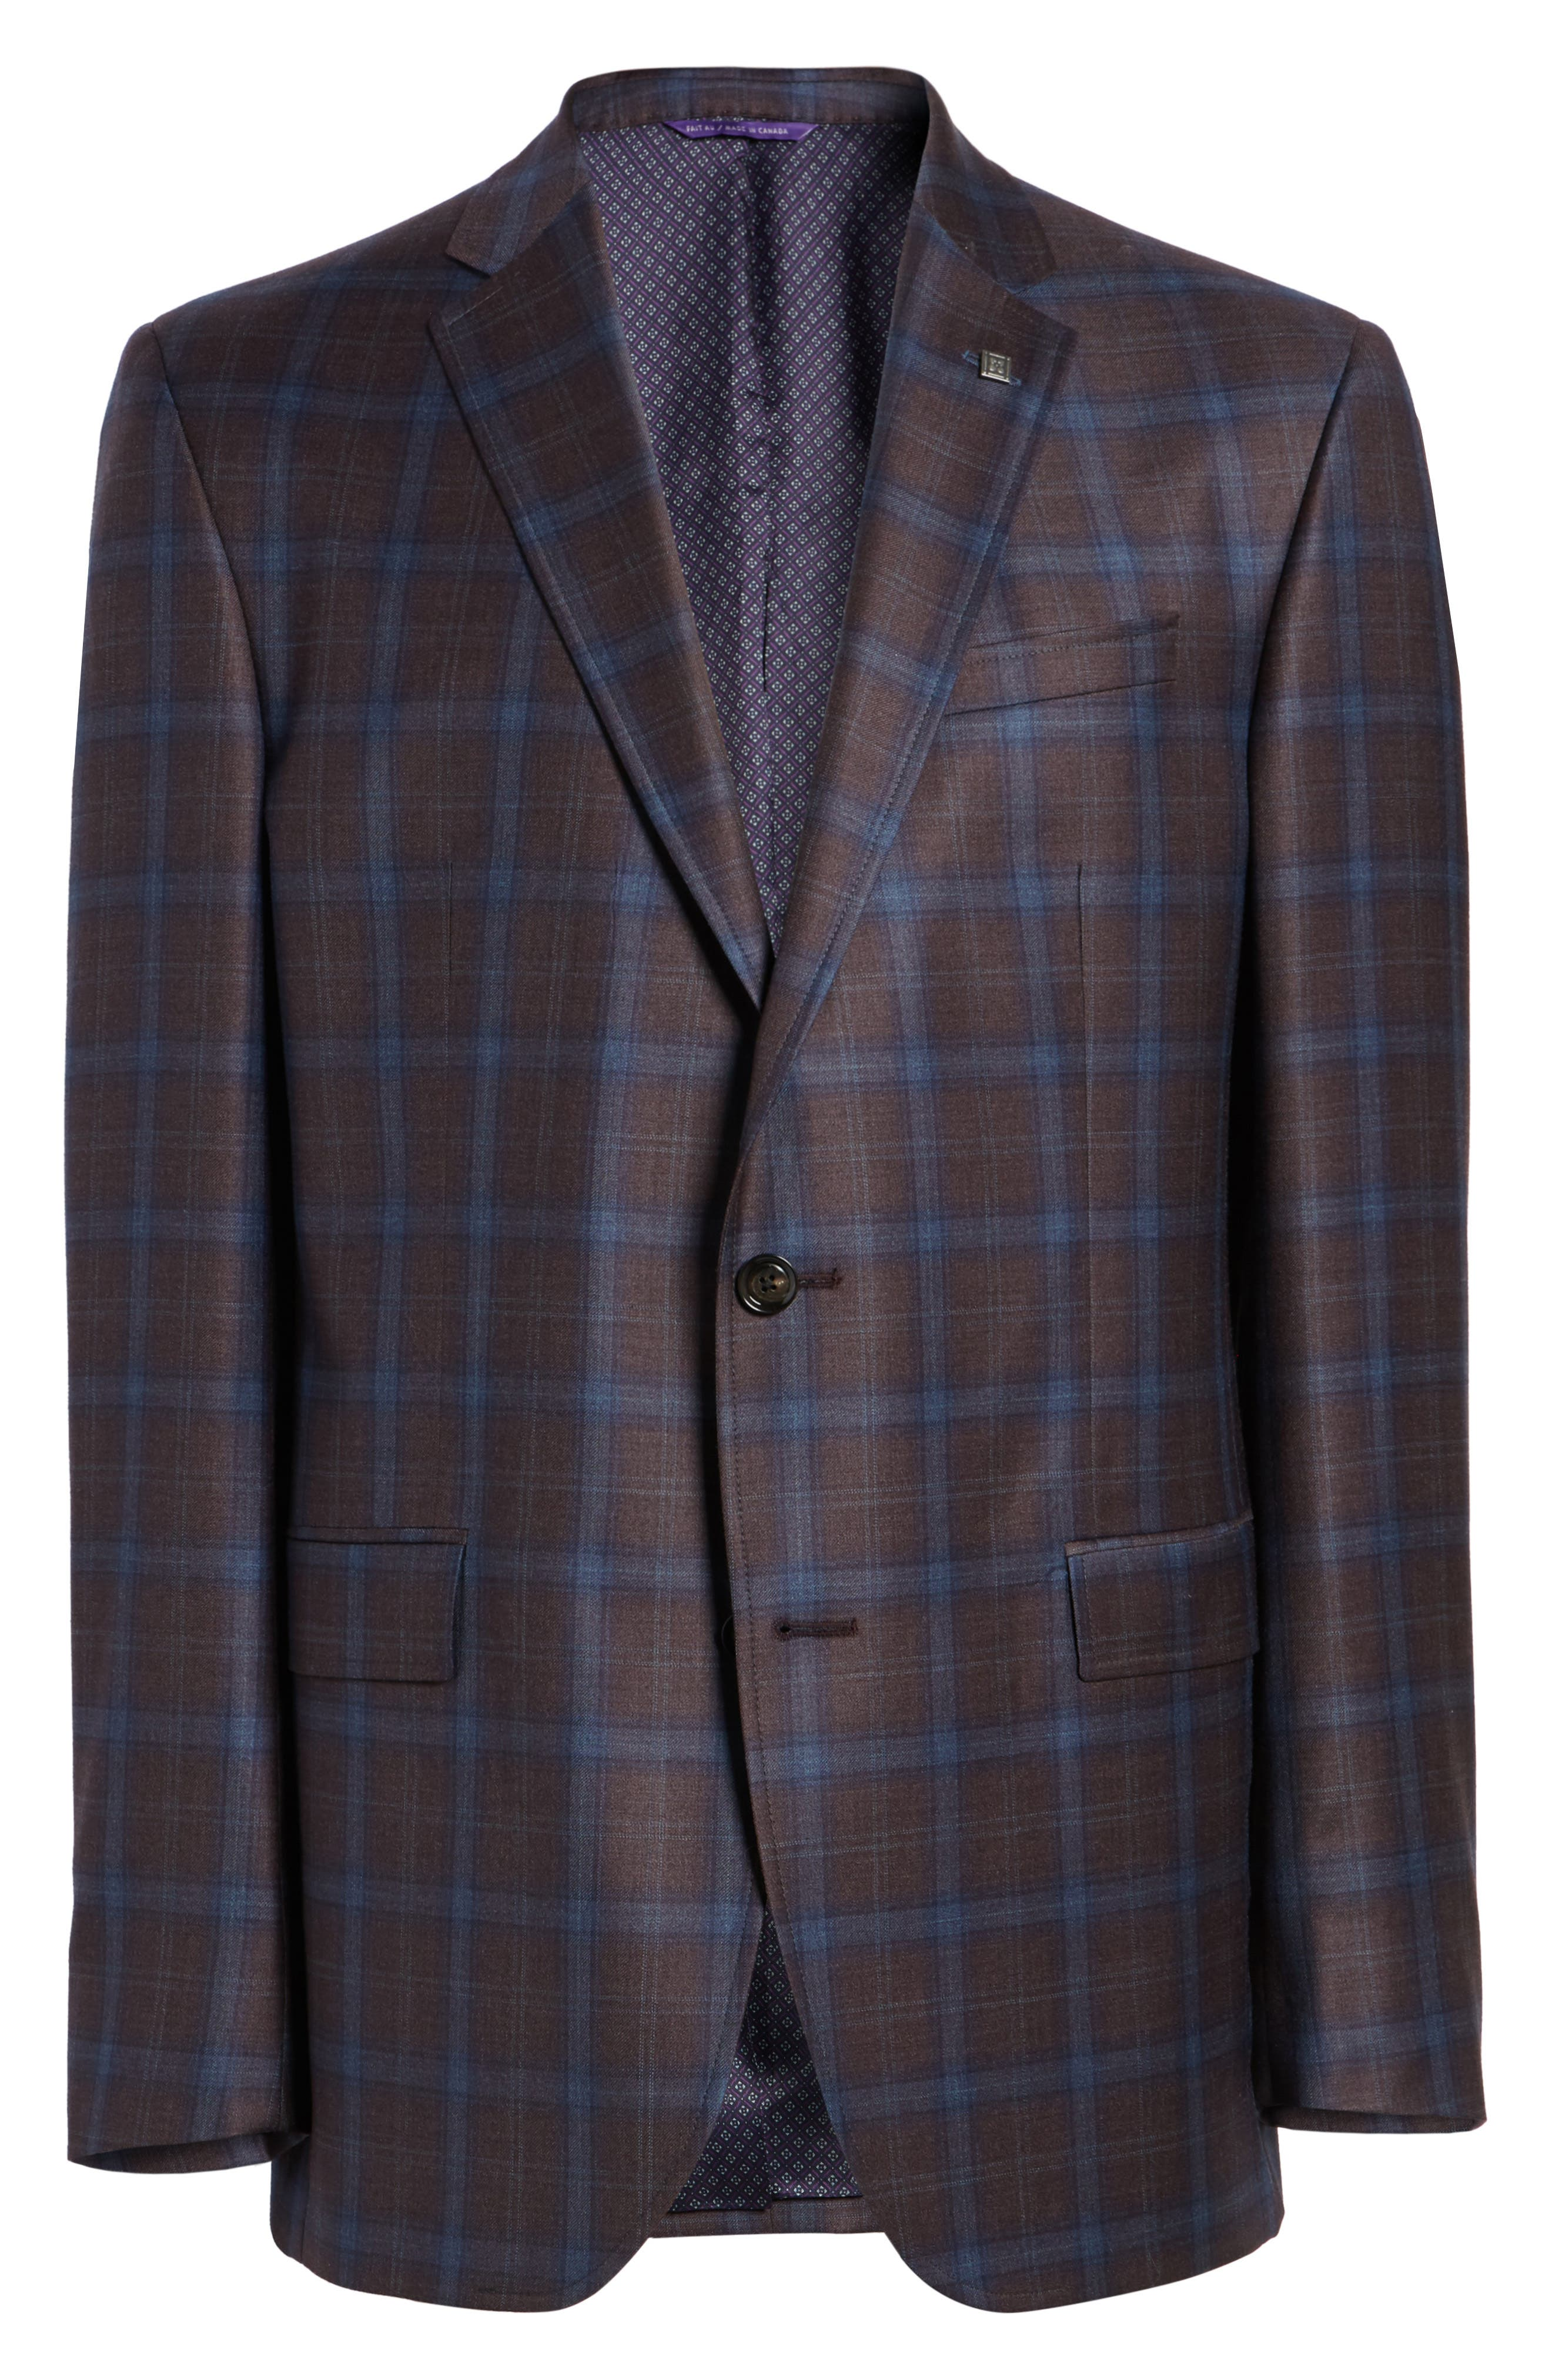 Jay Trim Fit Plaid Wool Sport Coat,                             Alternate thumbnail 5, color,                             932